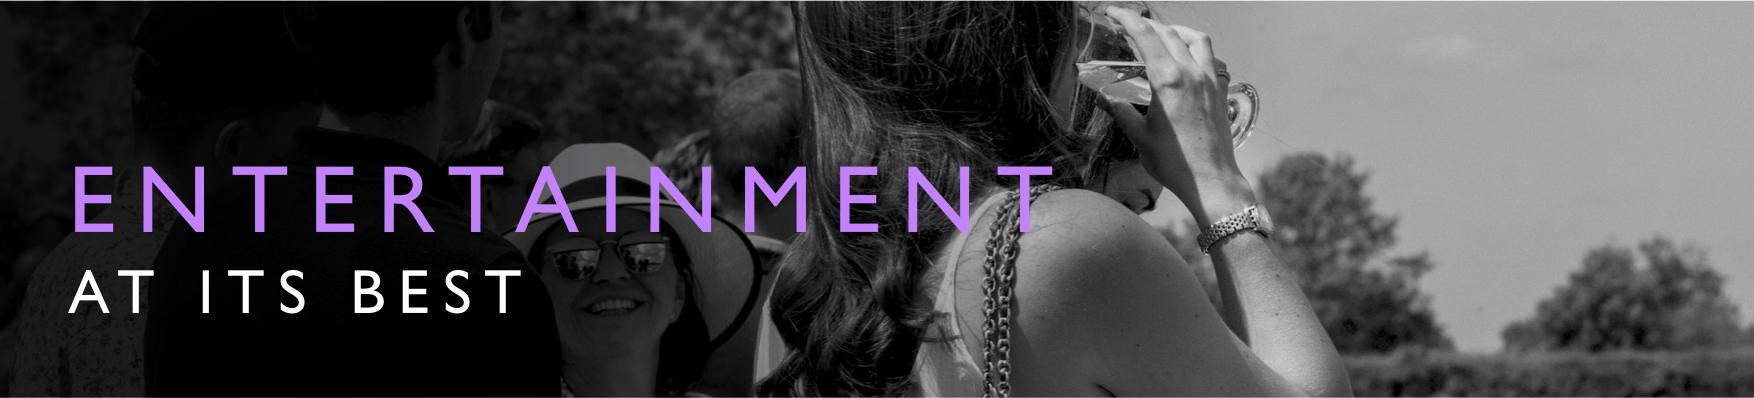 Ladies Entertainment Banner JPEG.jpg